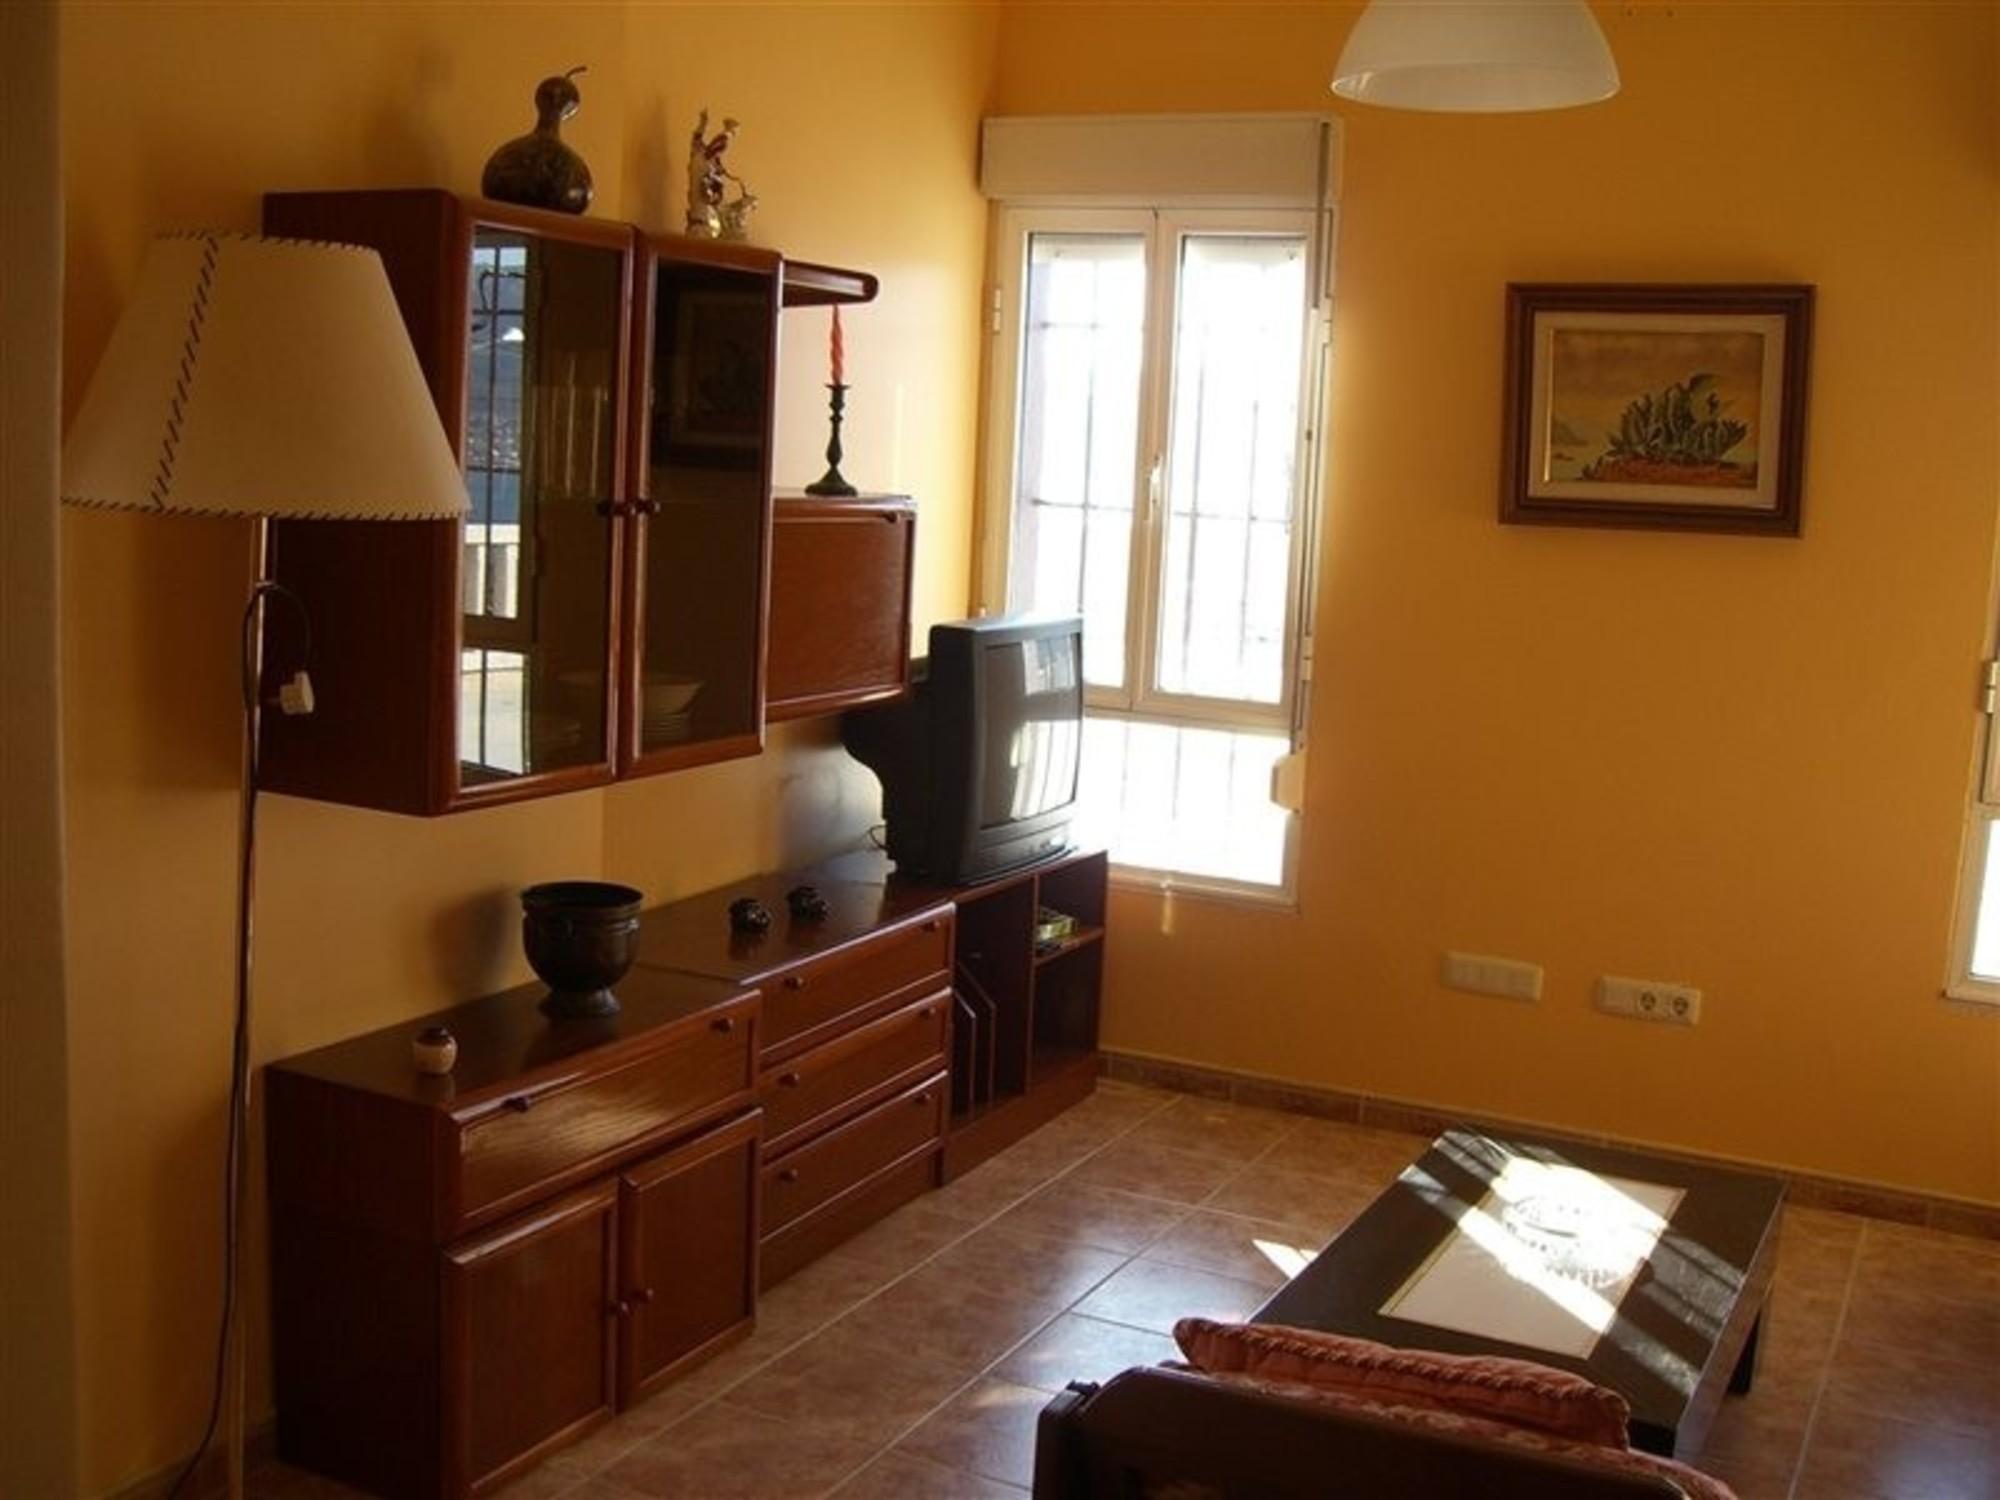 Ferienwohnung Apartment - 2 Bedrooms - 100119 (1937591), Vigo, Rias Bajas, Galicien, Spanien, Bild 3